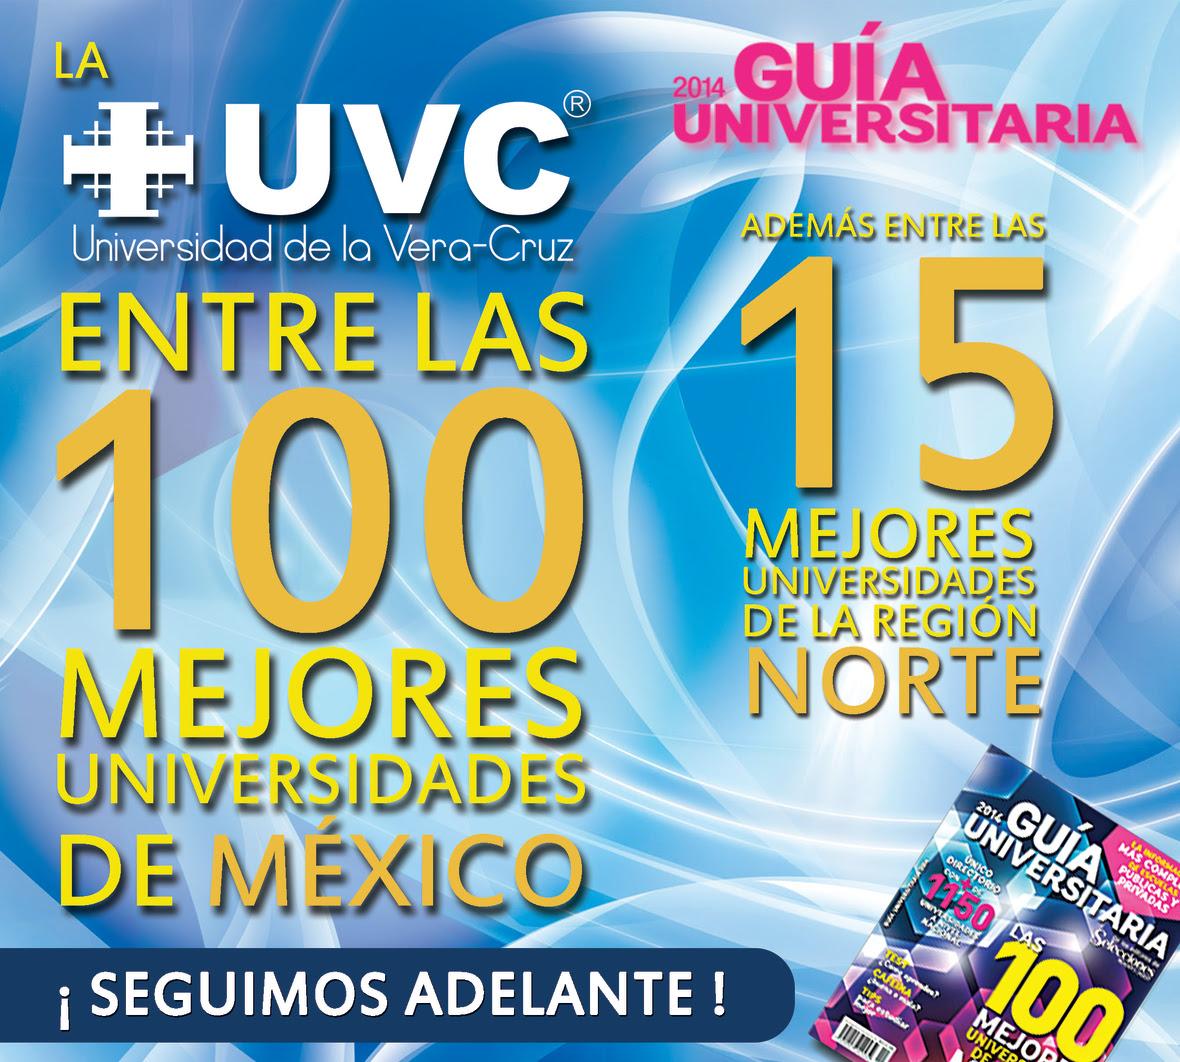 Lona Guia Universitaria 2014 copy